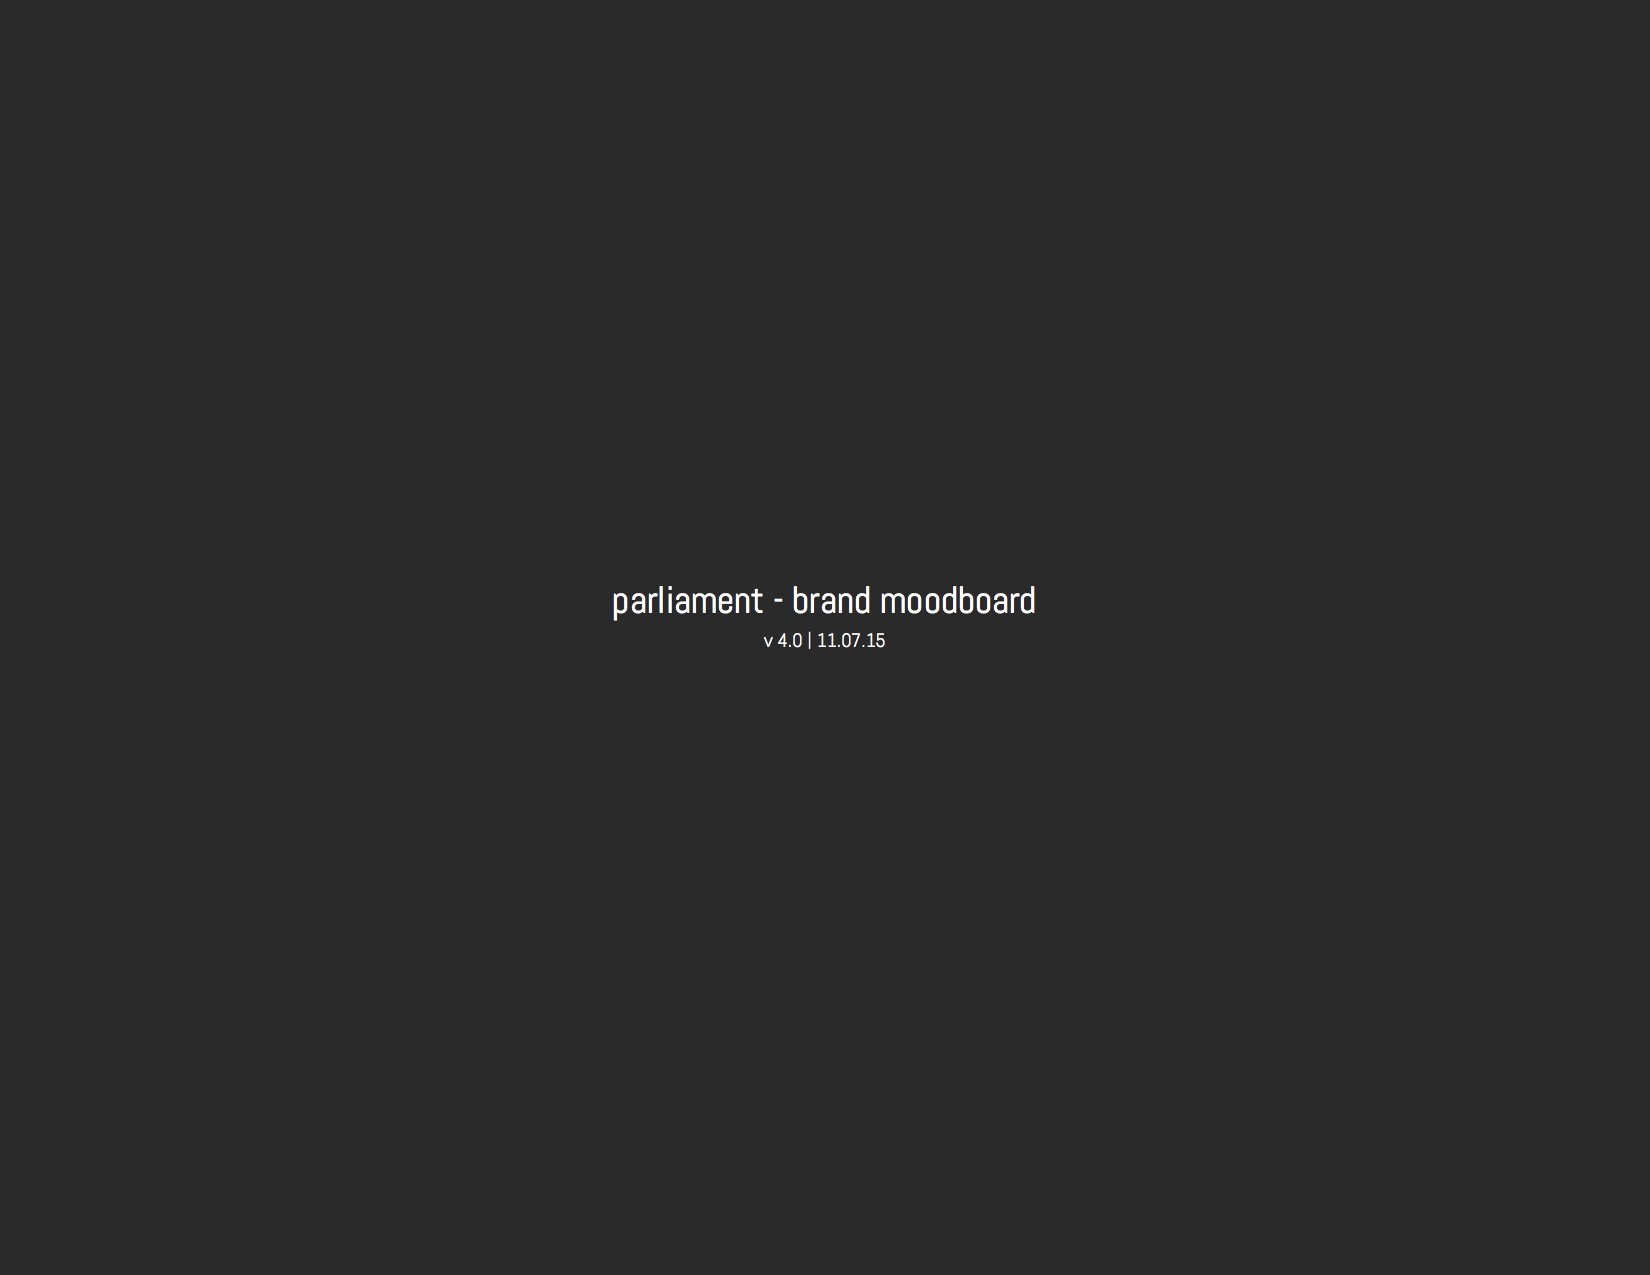 parliament_moodboard_v4.jpg